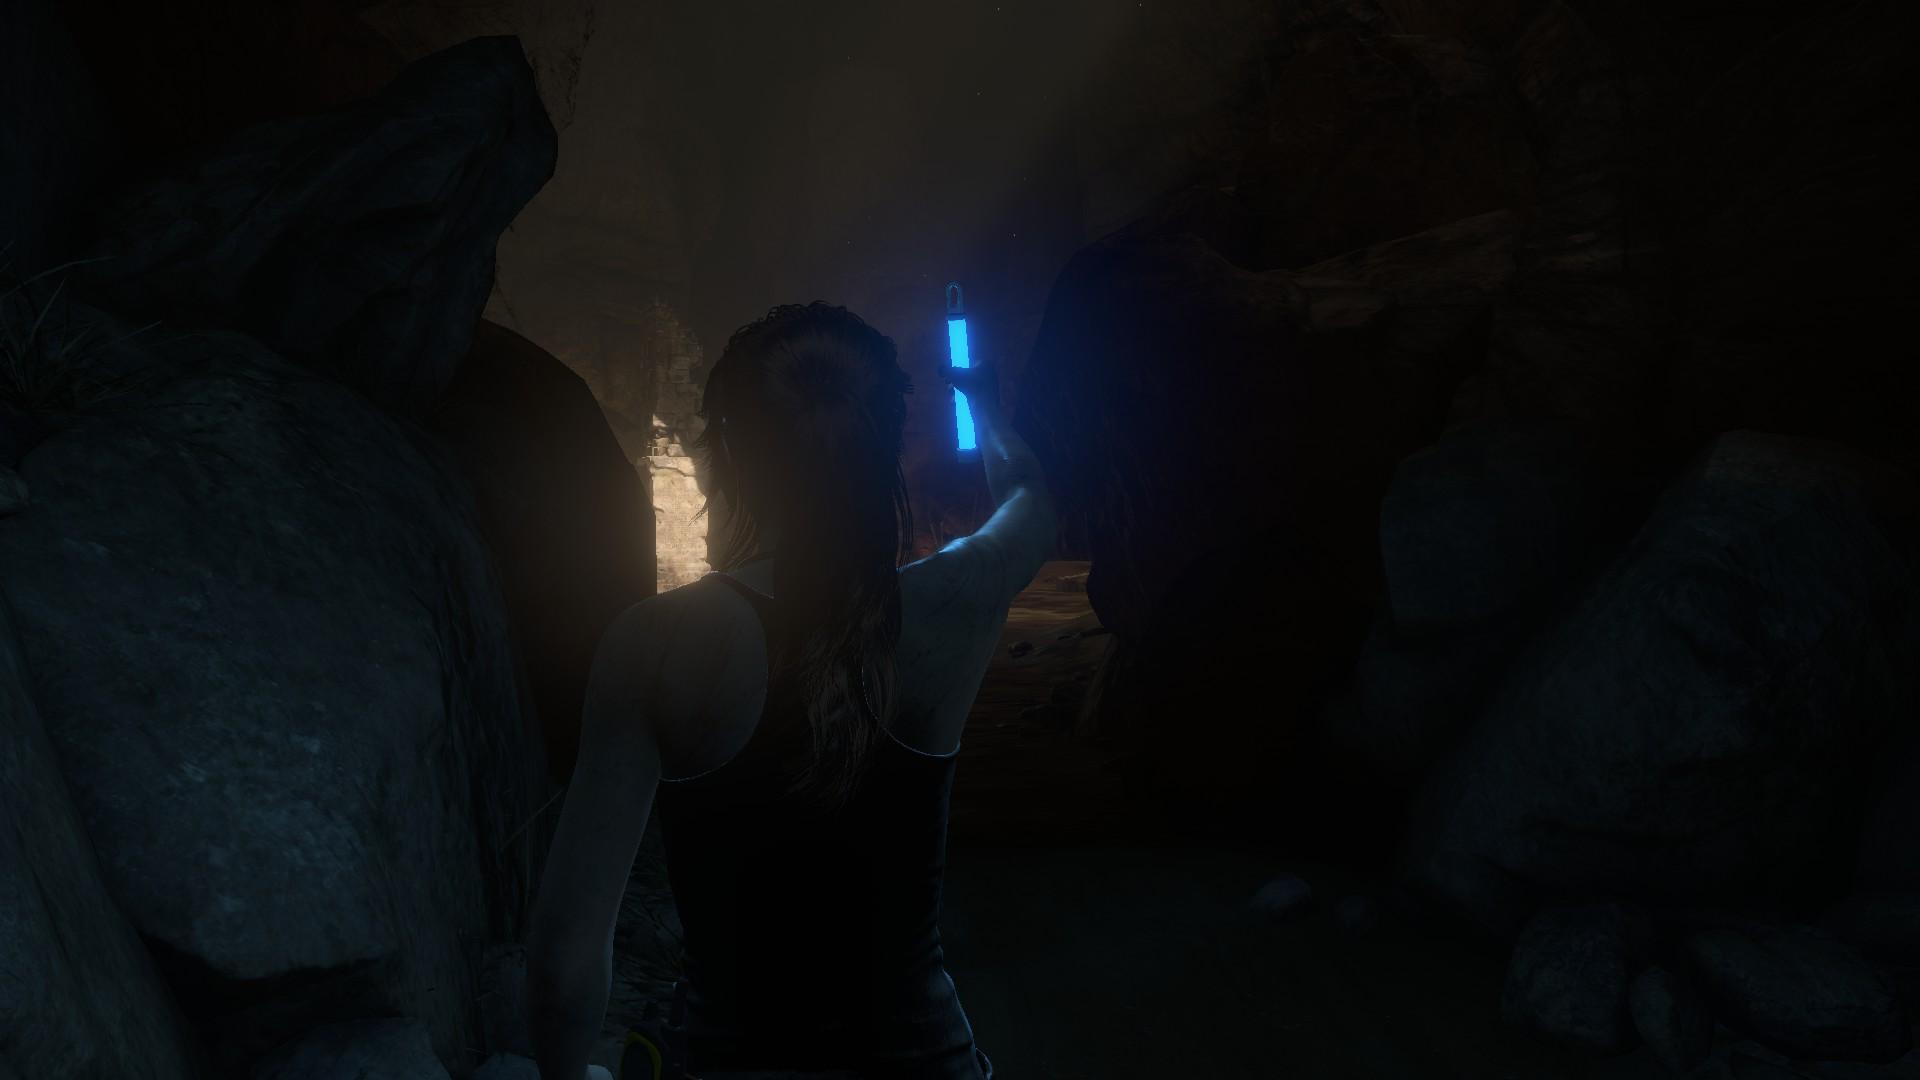 20171203201649_1.jpg - Rise of the Tomb Raider